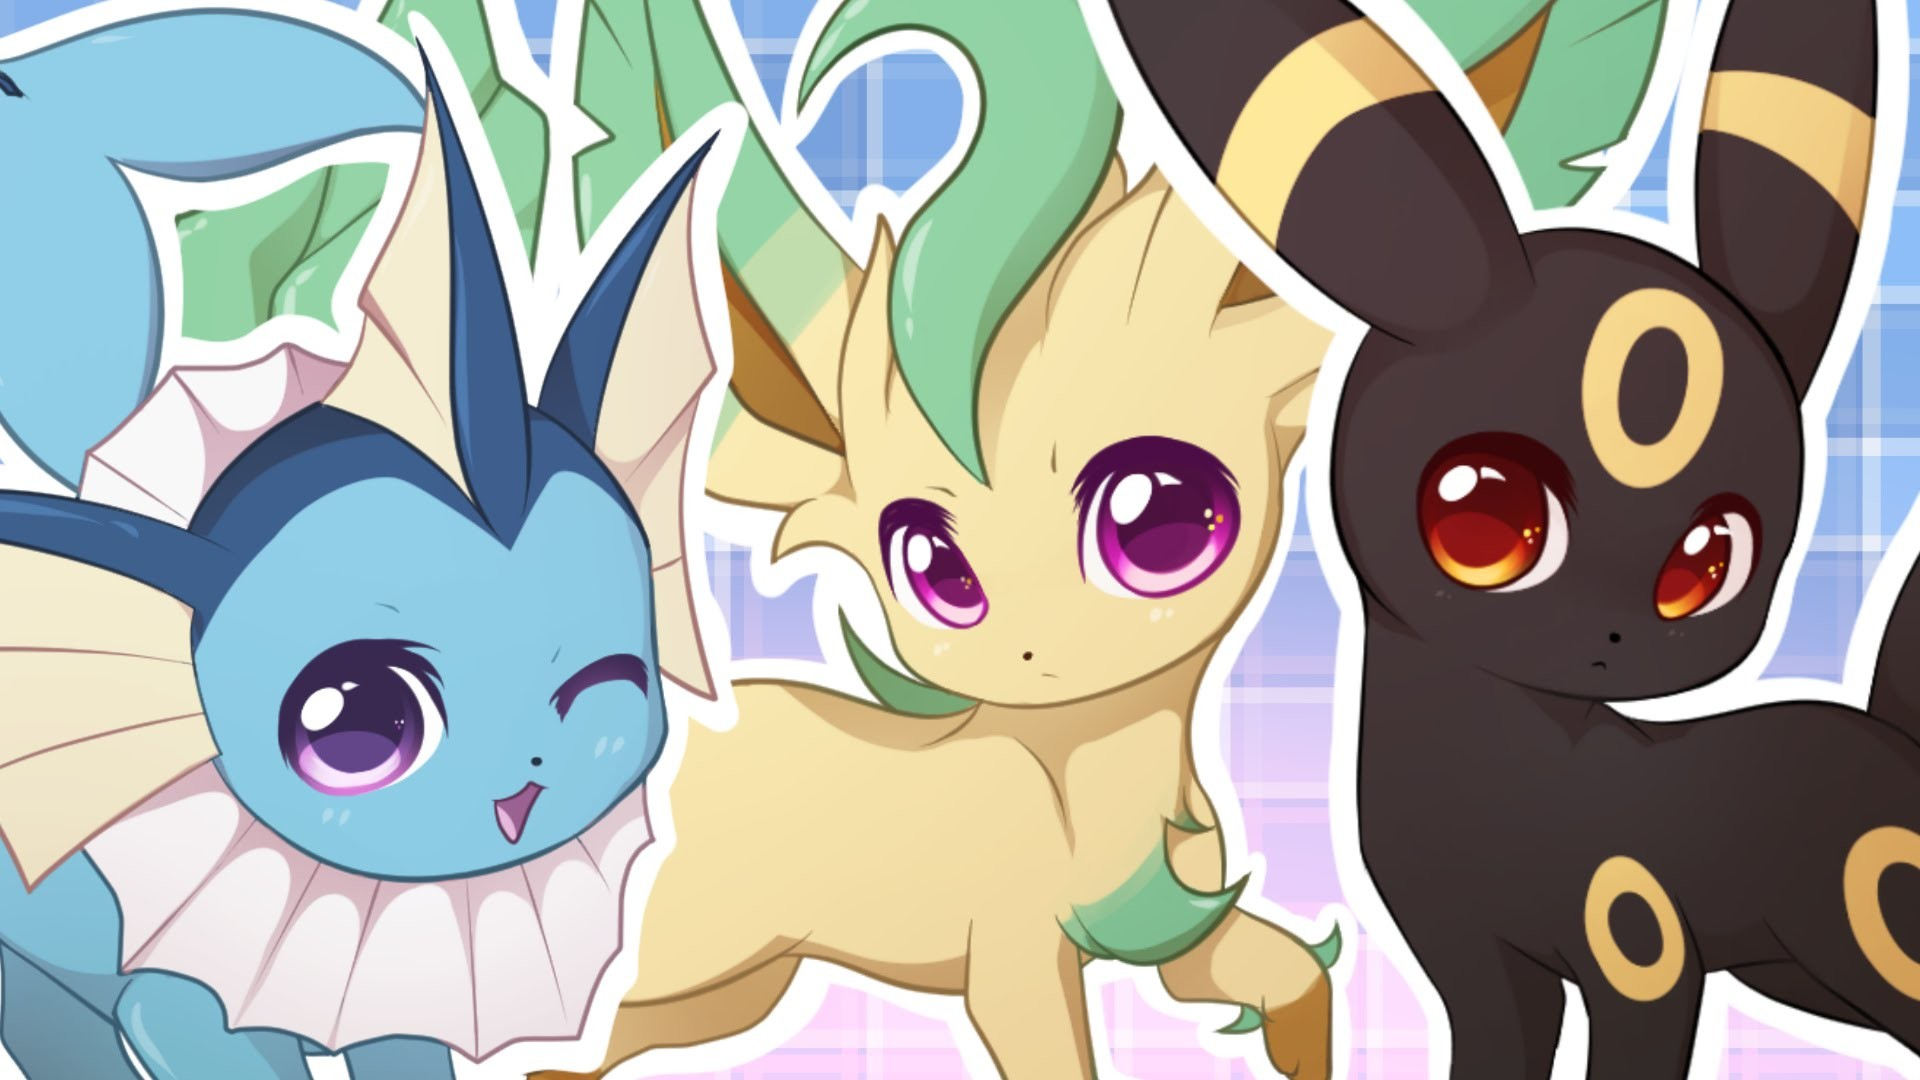 Chibi Eeveelutions | chibi pokemon eevee evolutions by .